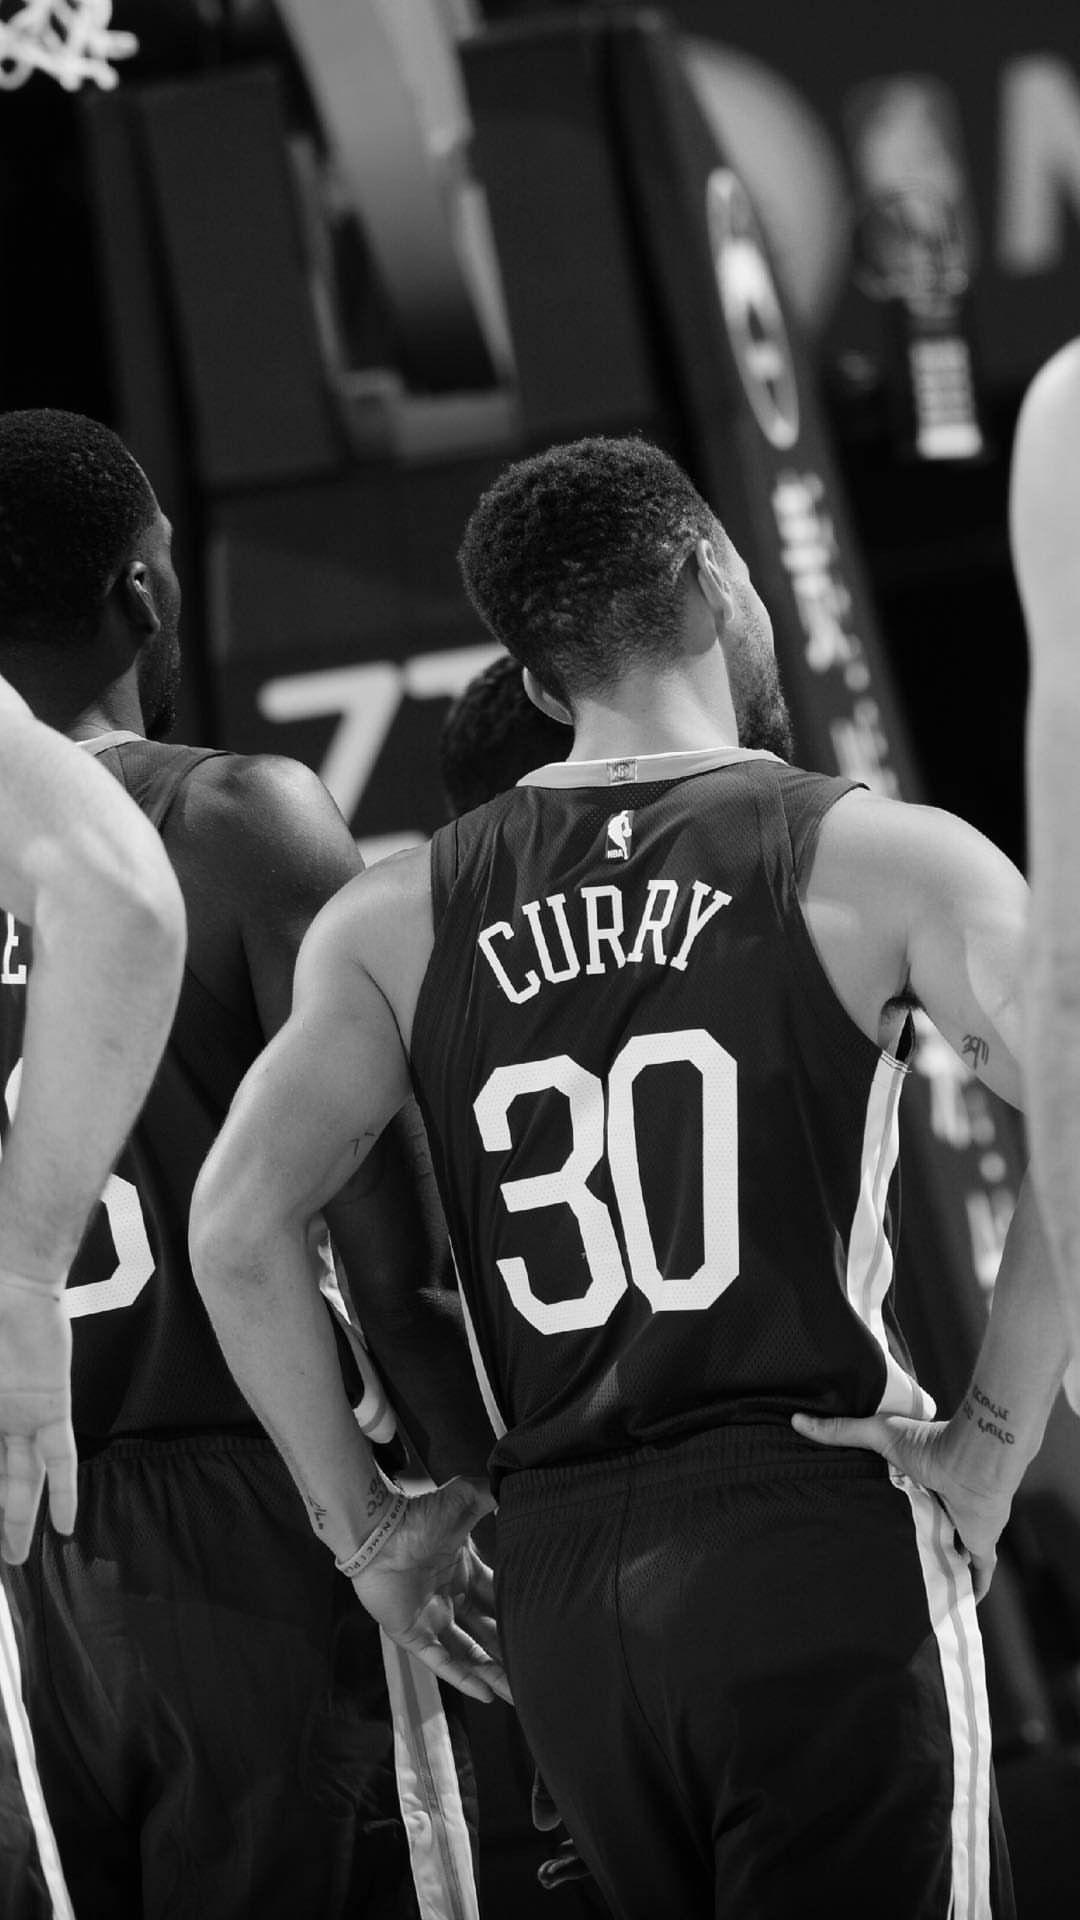 7a6f4190fbc Stephen Curry wallpaper #basketballdrills   Coug   Curry sthepen ...